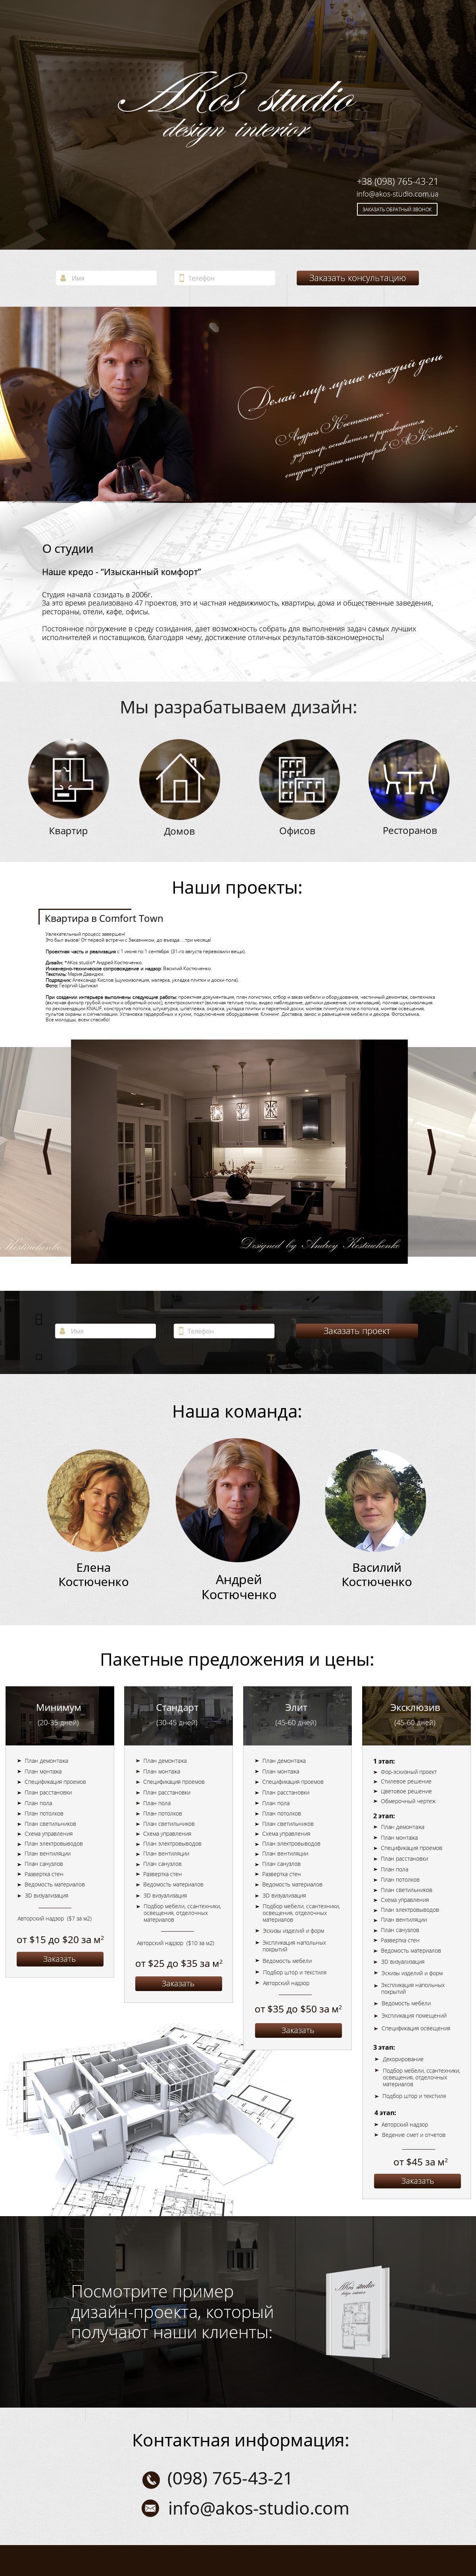 Akos-design.jpg